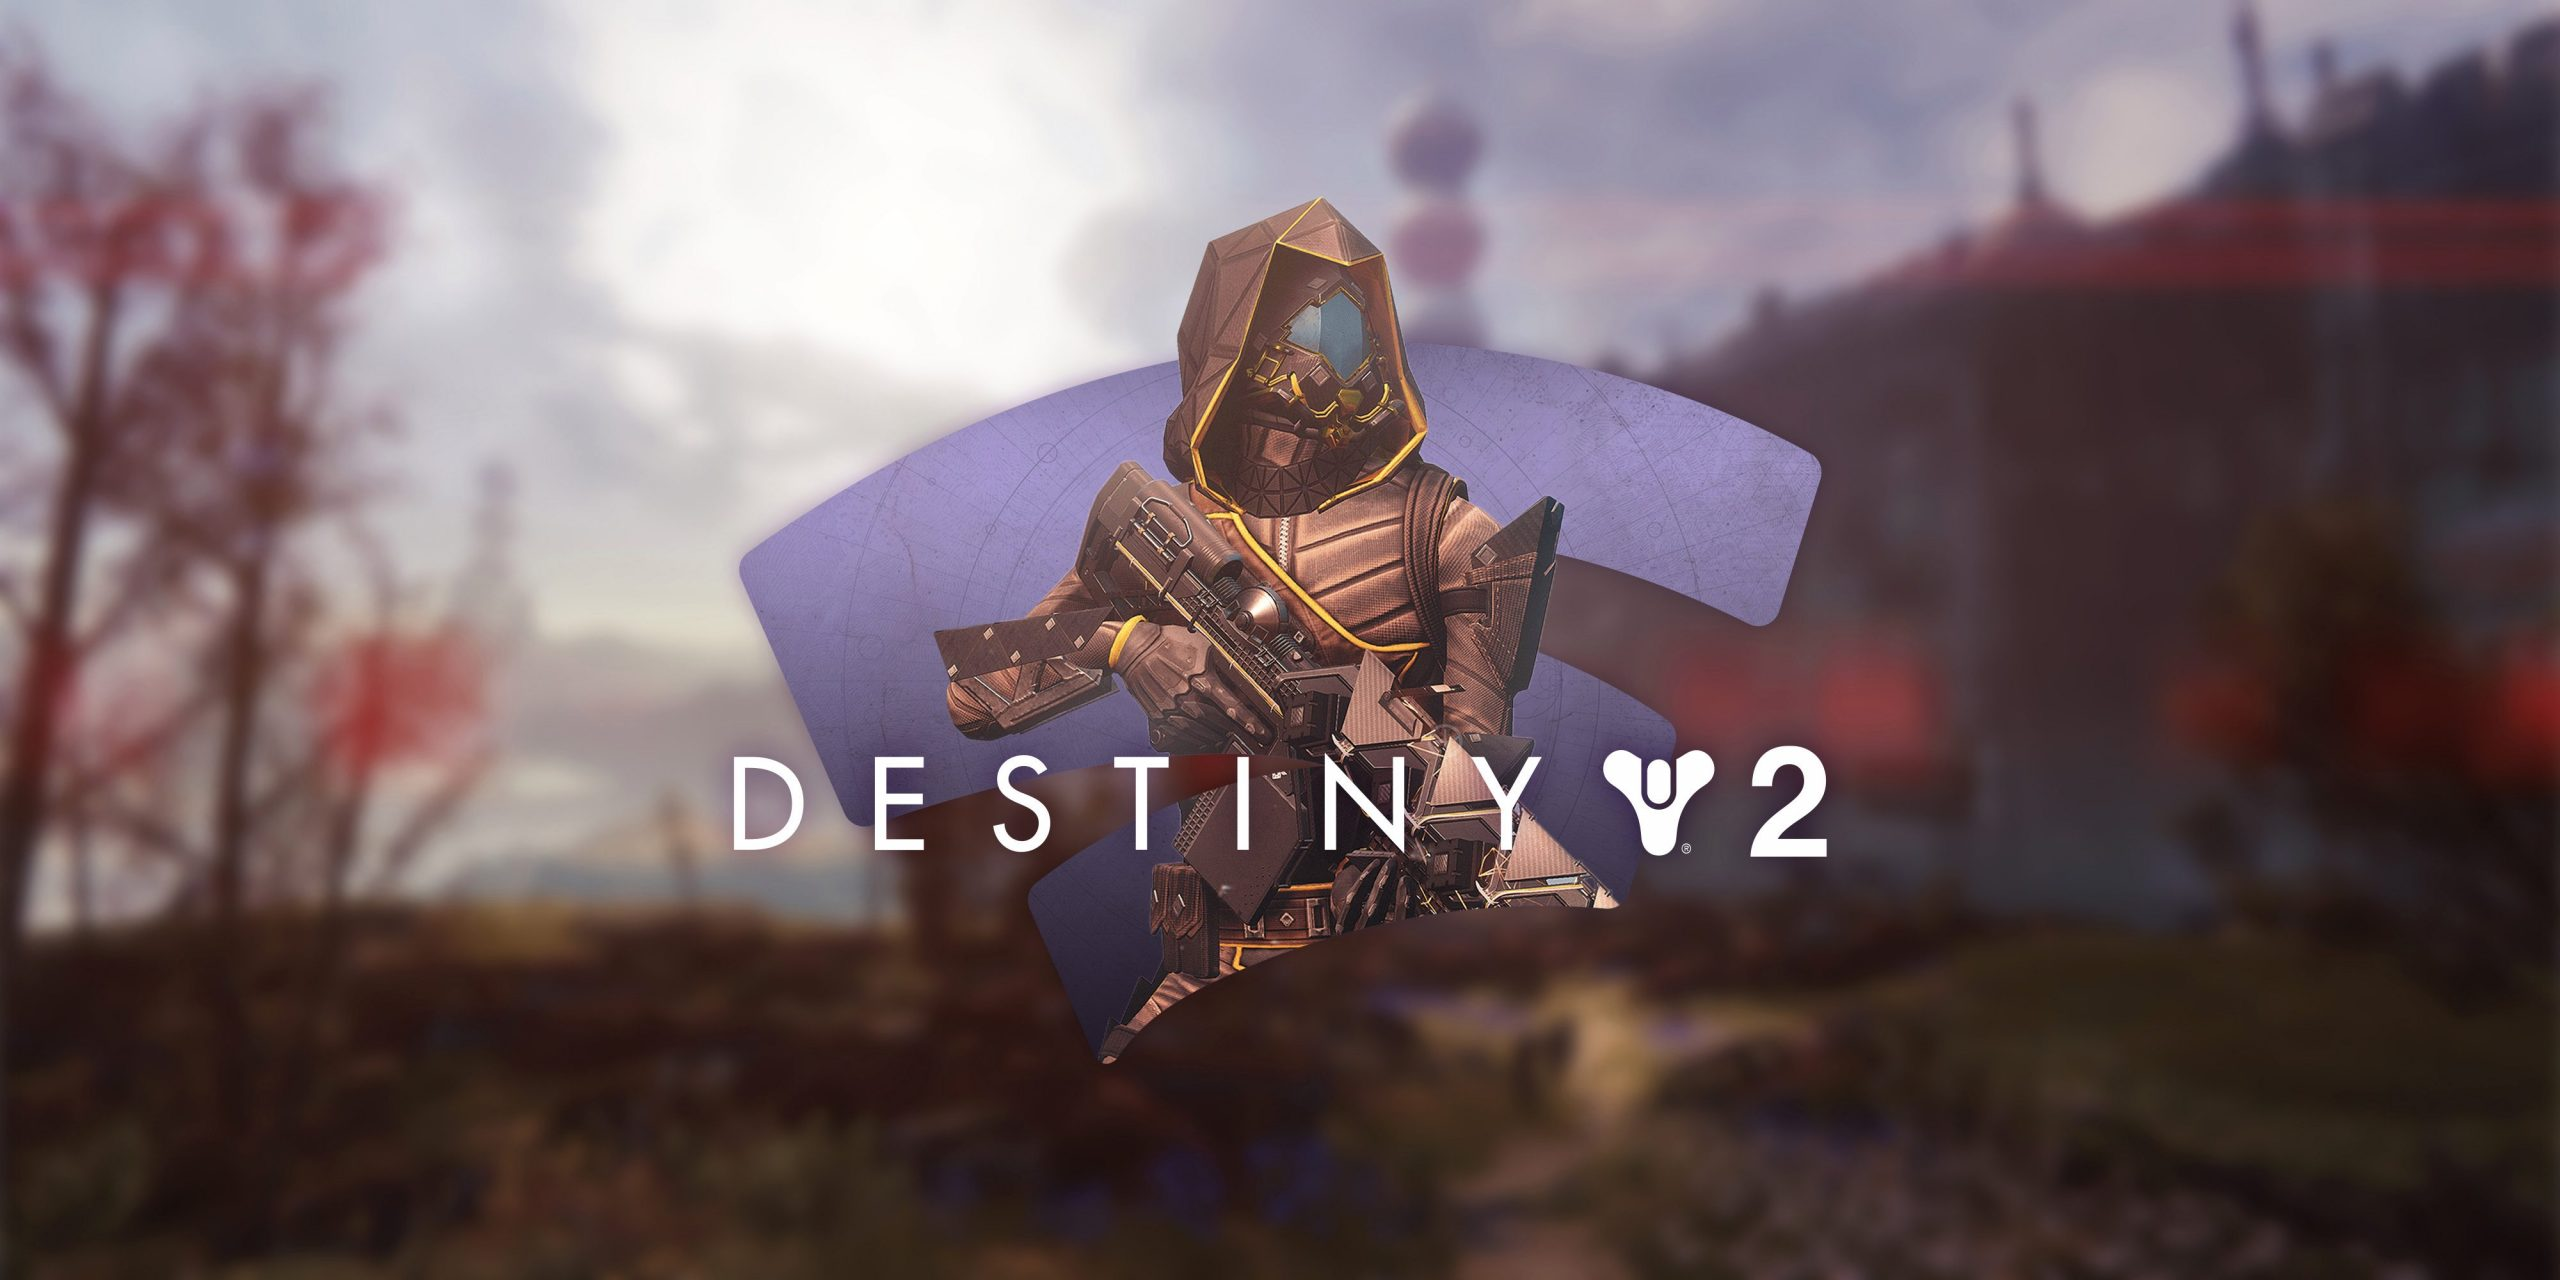 Destiny 2 Apk iOS Latest Version Free Download